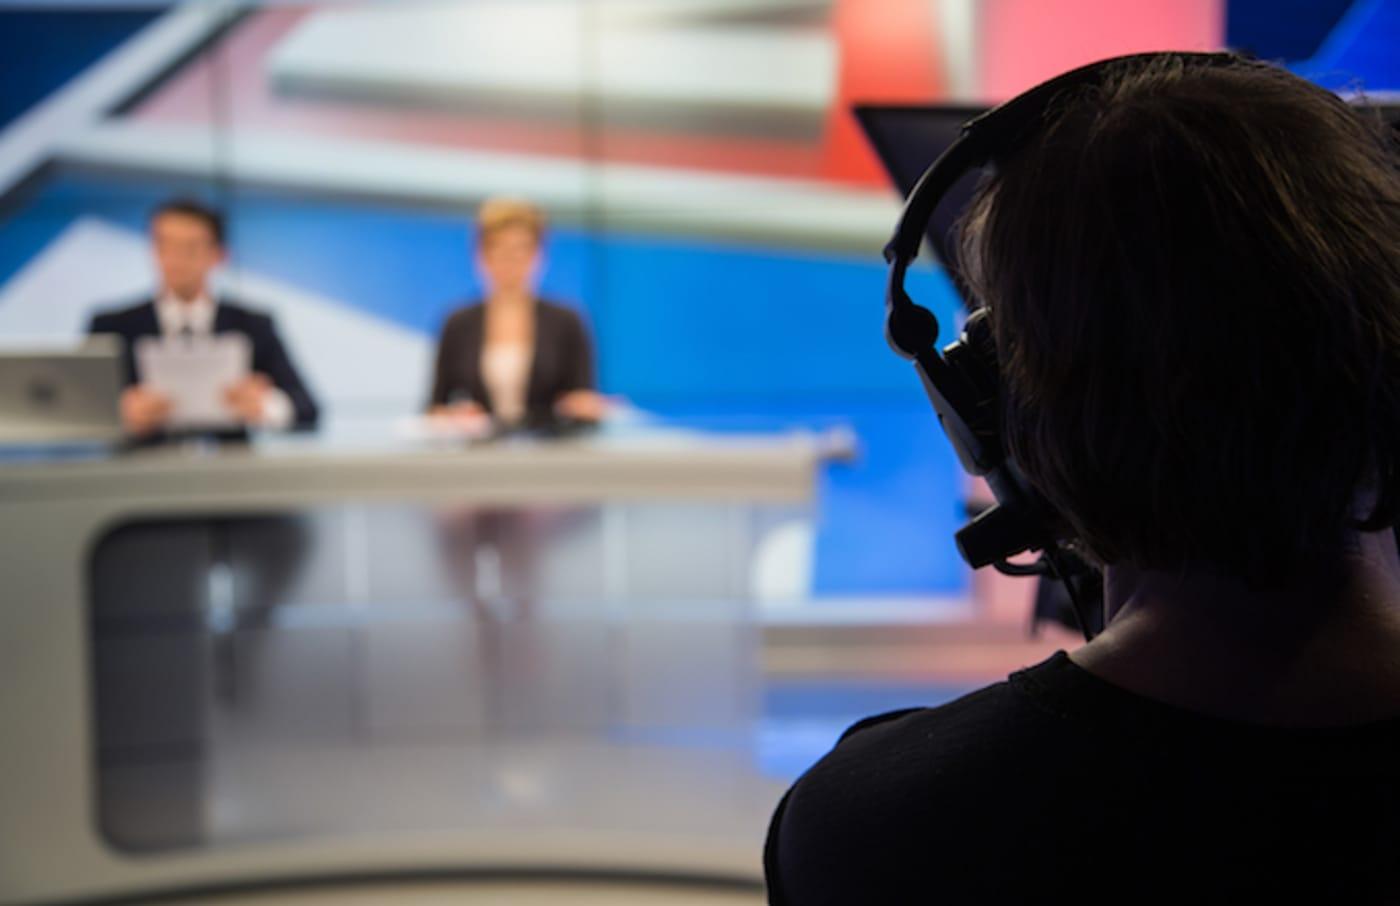 Cameraman filming news in television studio.